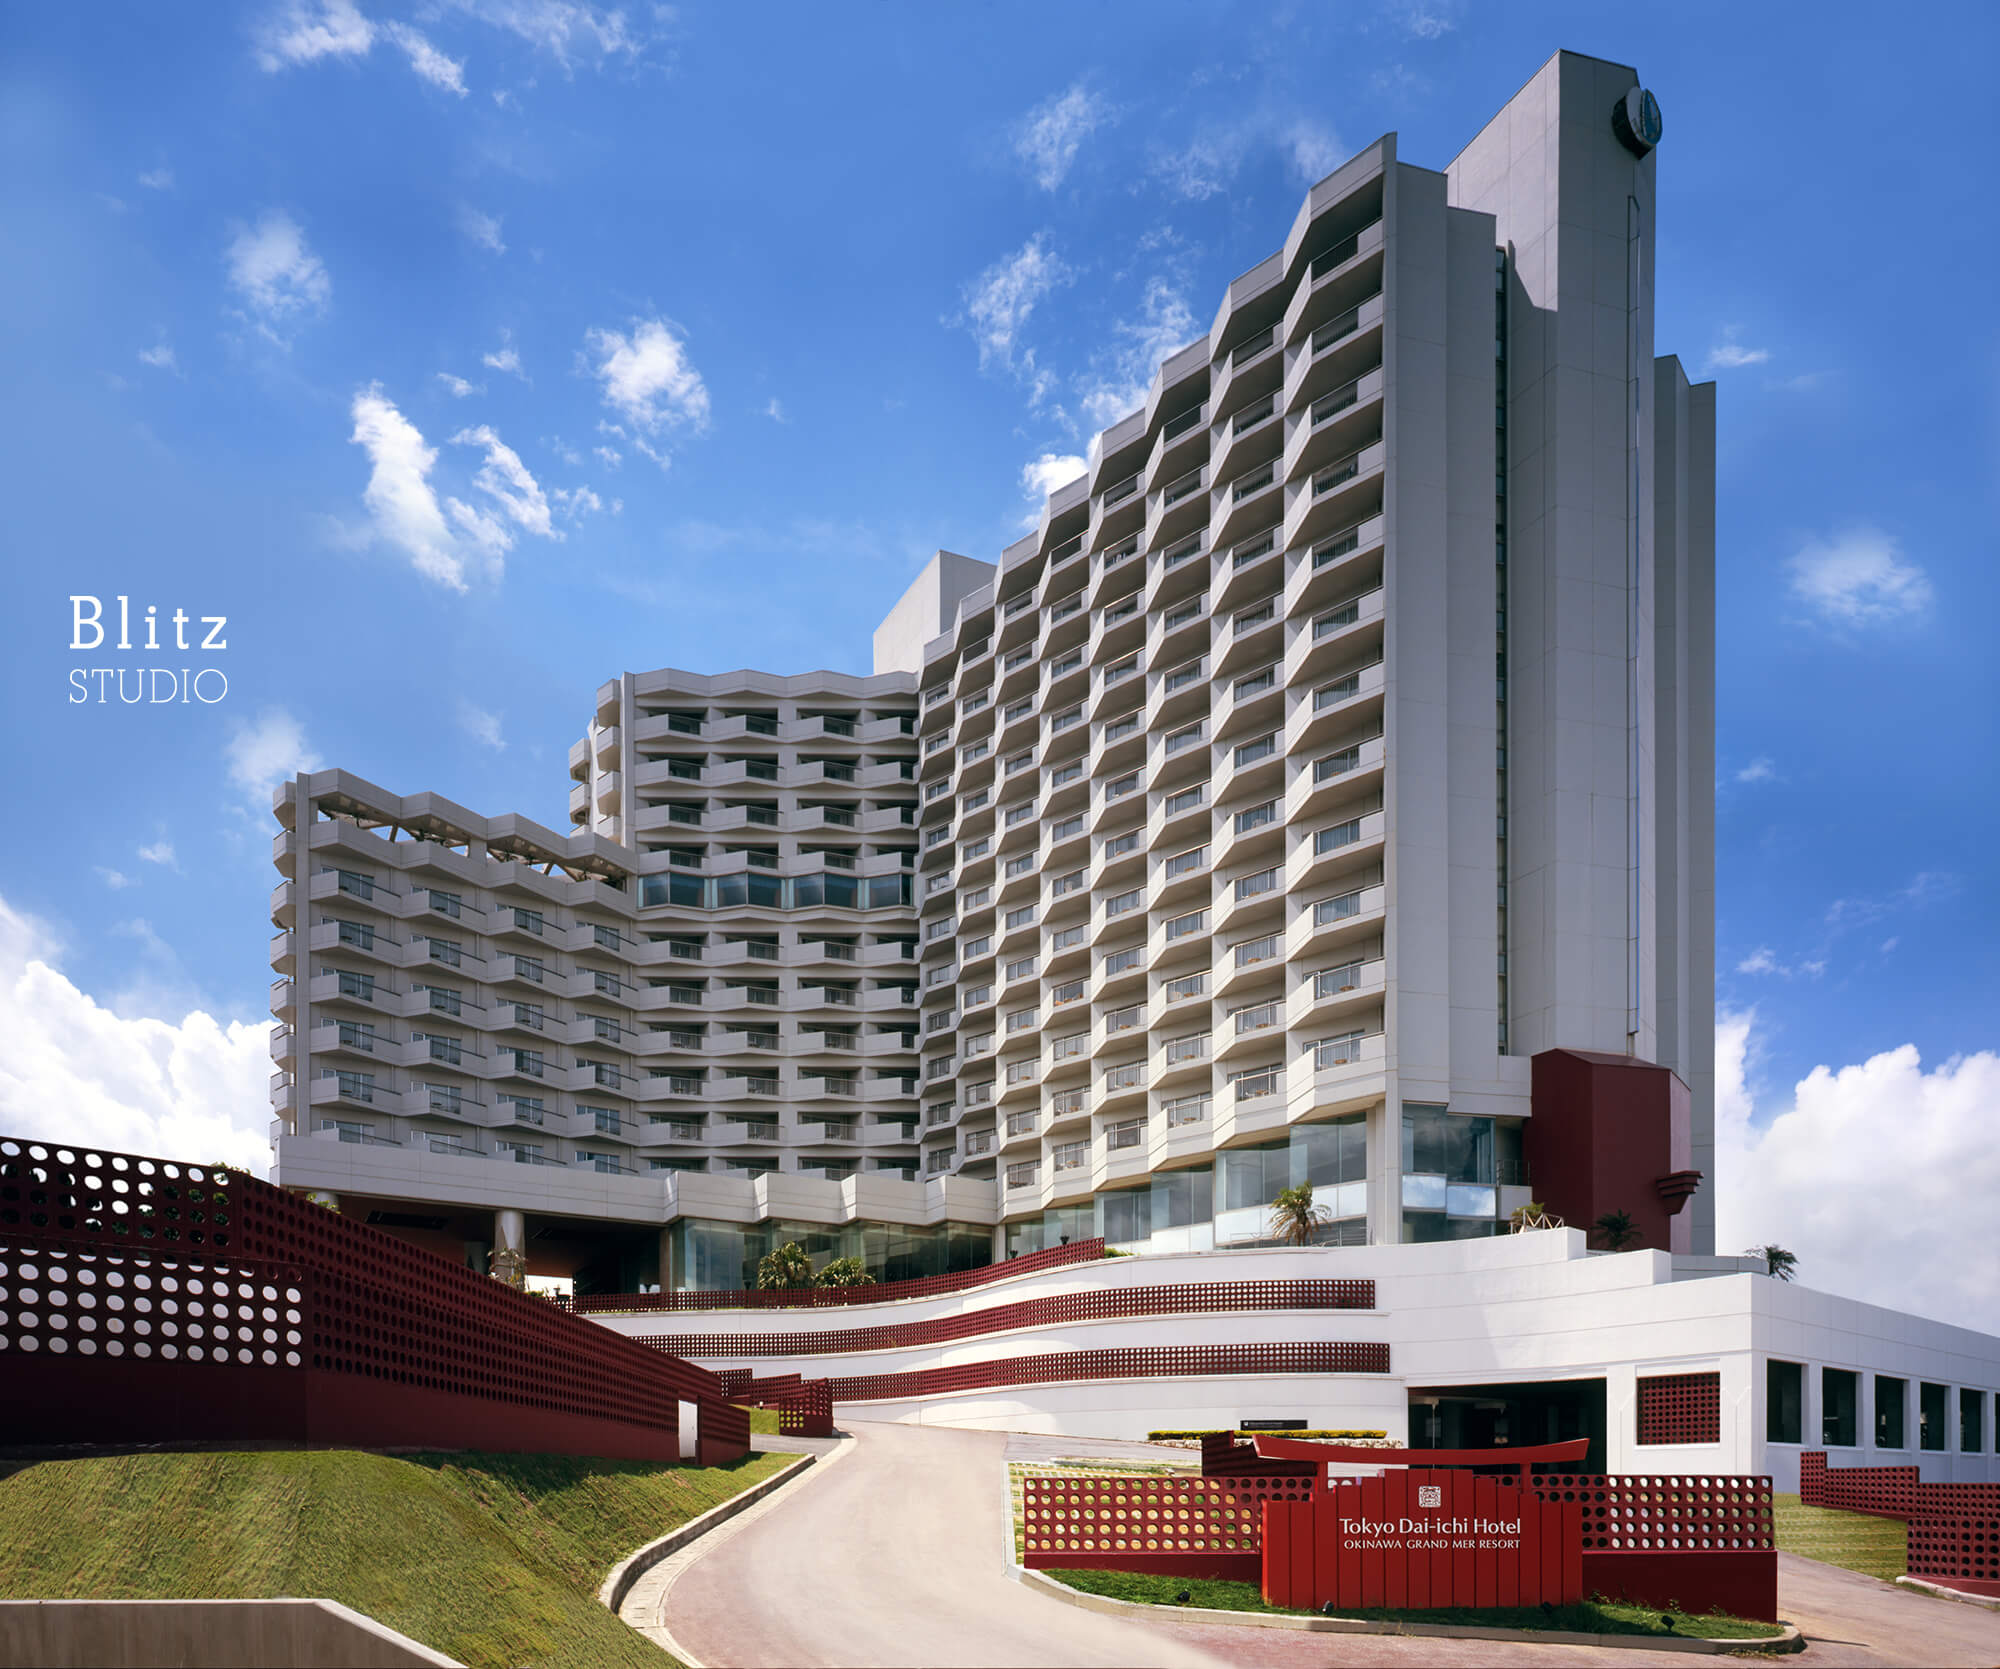 『OKINAWA GRAND MER RESORT』-沖縄県沖縄市-建築写真・竣工写真・インテリア写真1